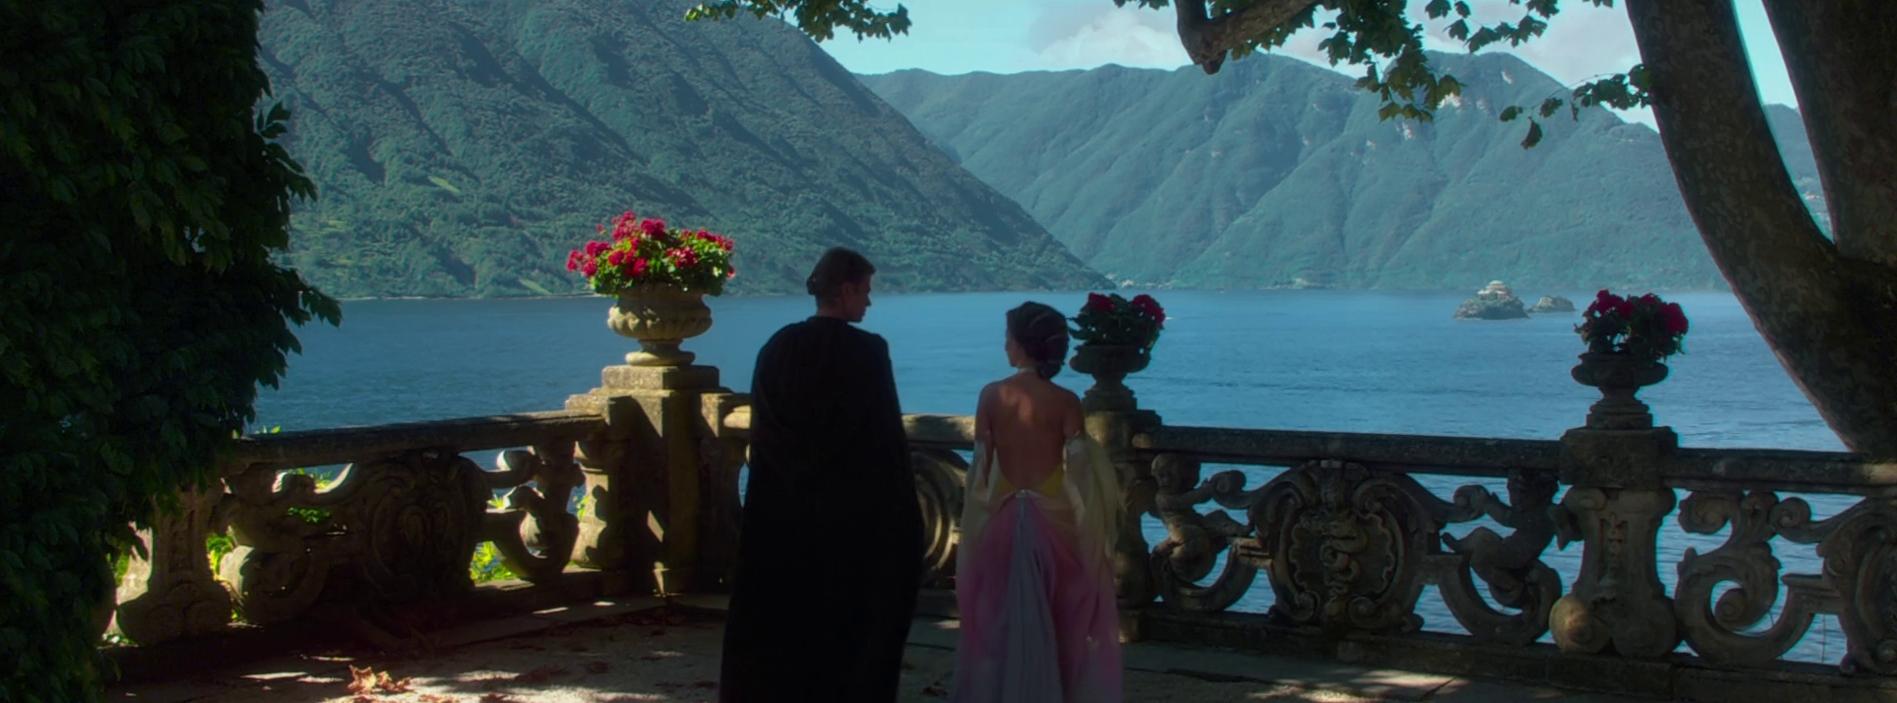 A Visit to Naboo: Villa Balbianello on Lake Como | GRIN TRAVEL